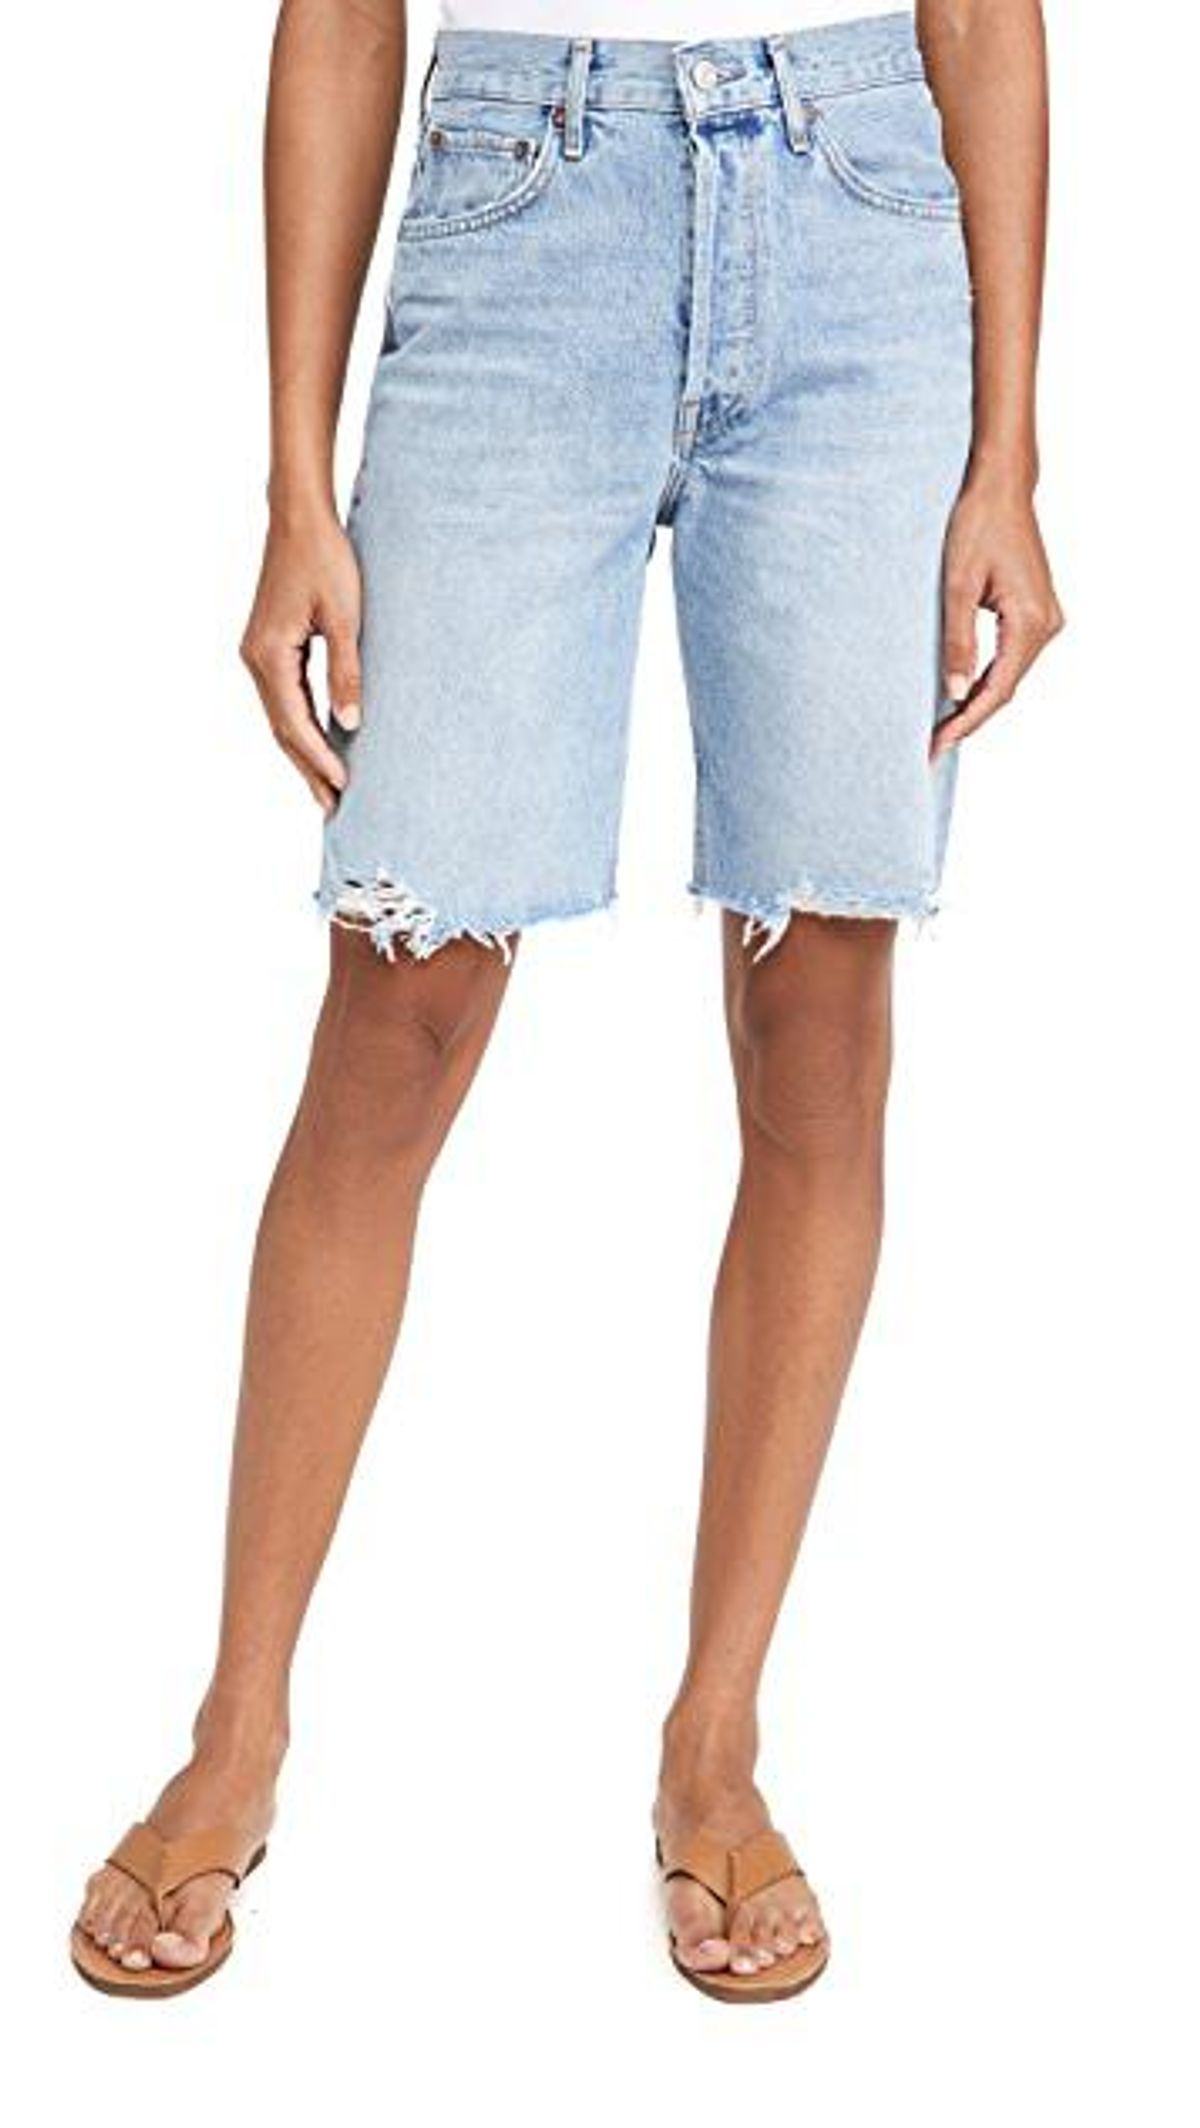 '90s Short Mid Rise Loose Shorts